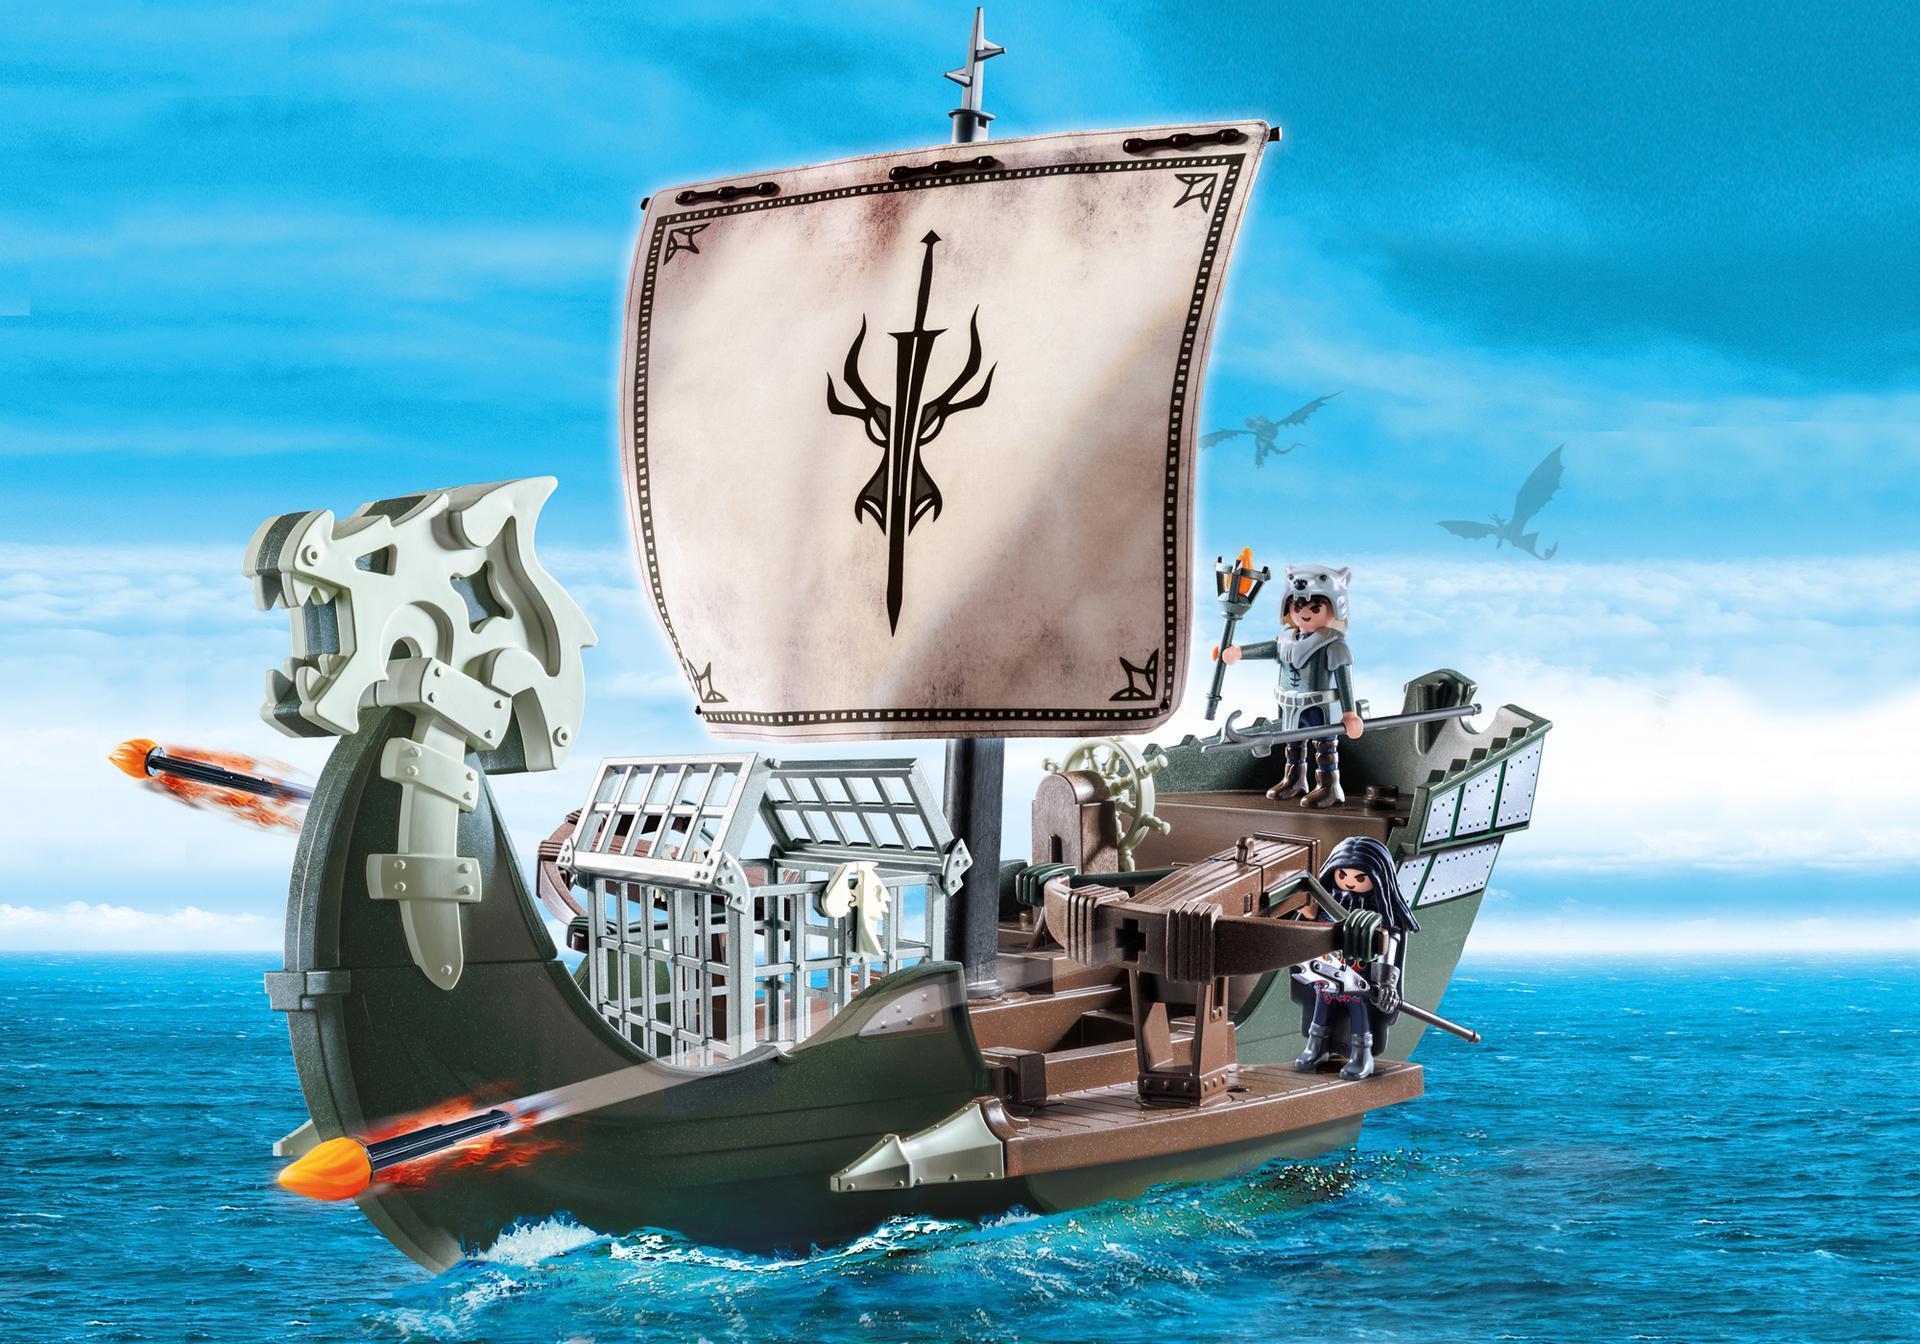 Dragons - Drago et vaisseau d'attaque - 9244